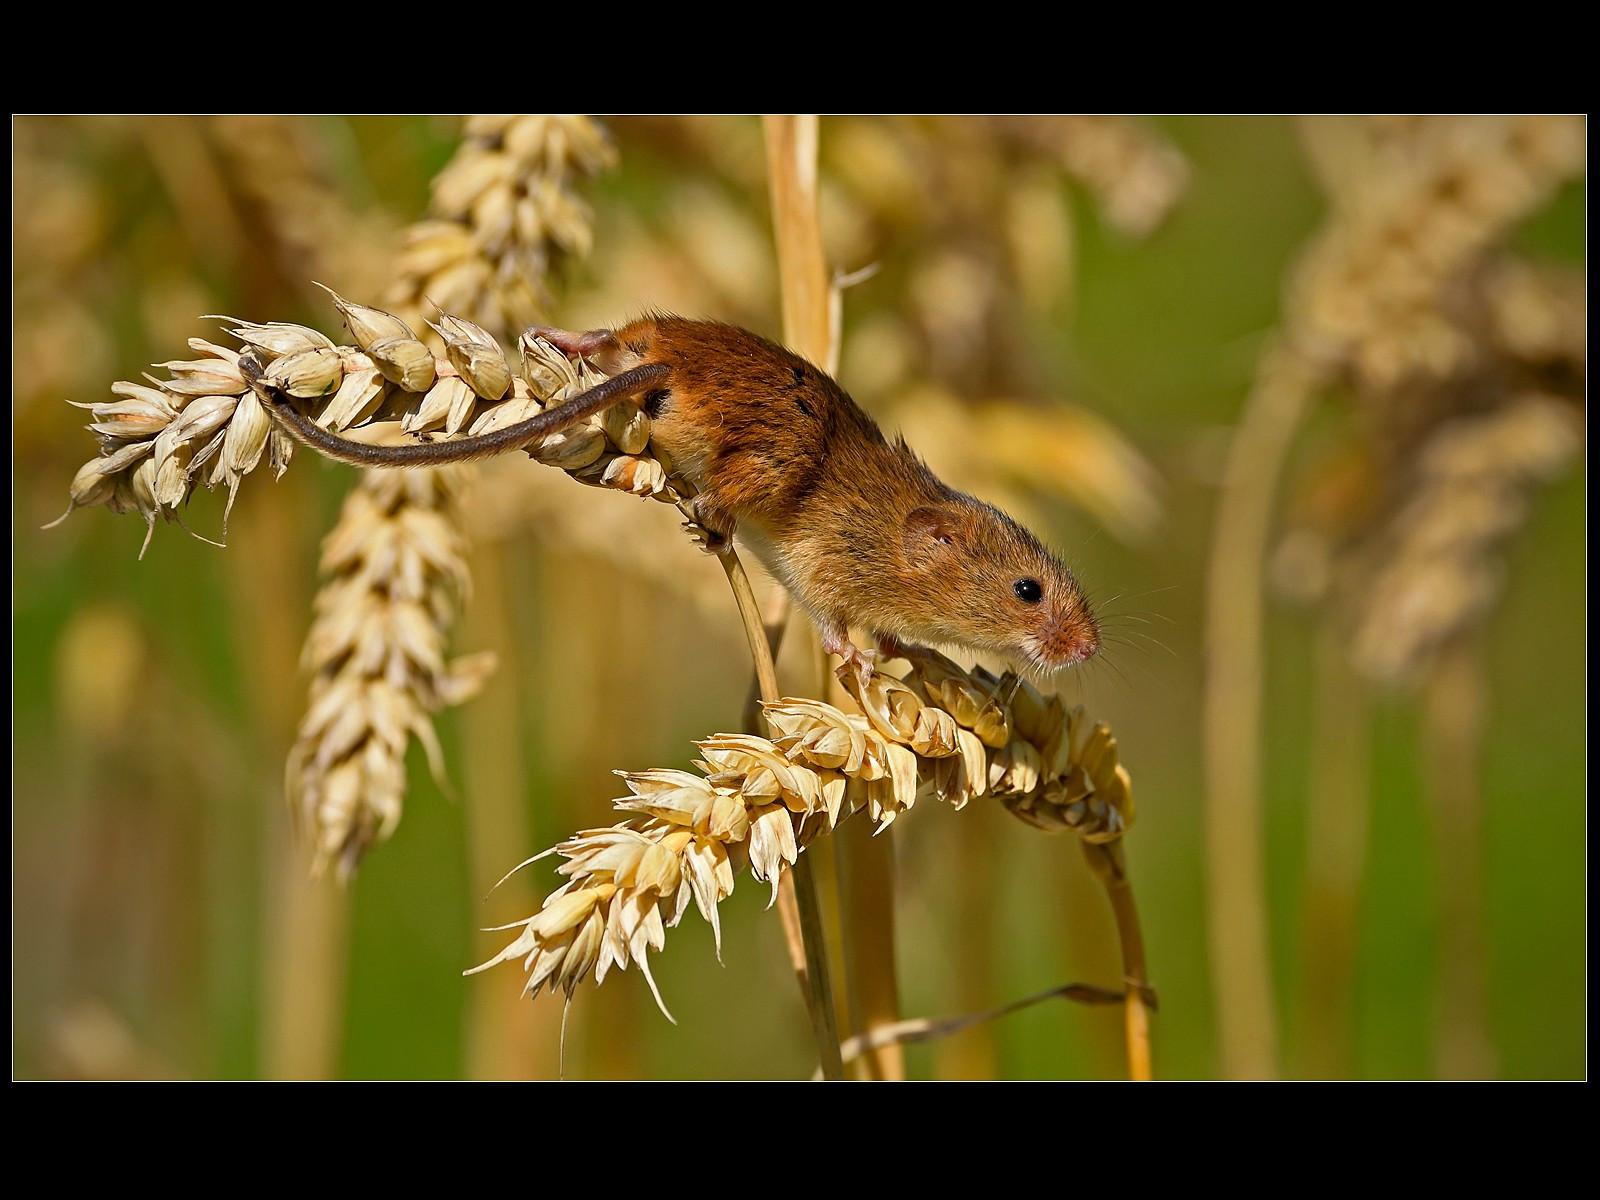 Harvest Mouse on Corn